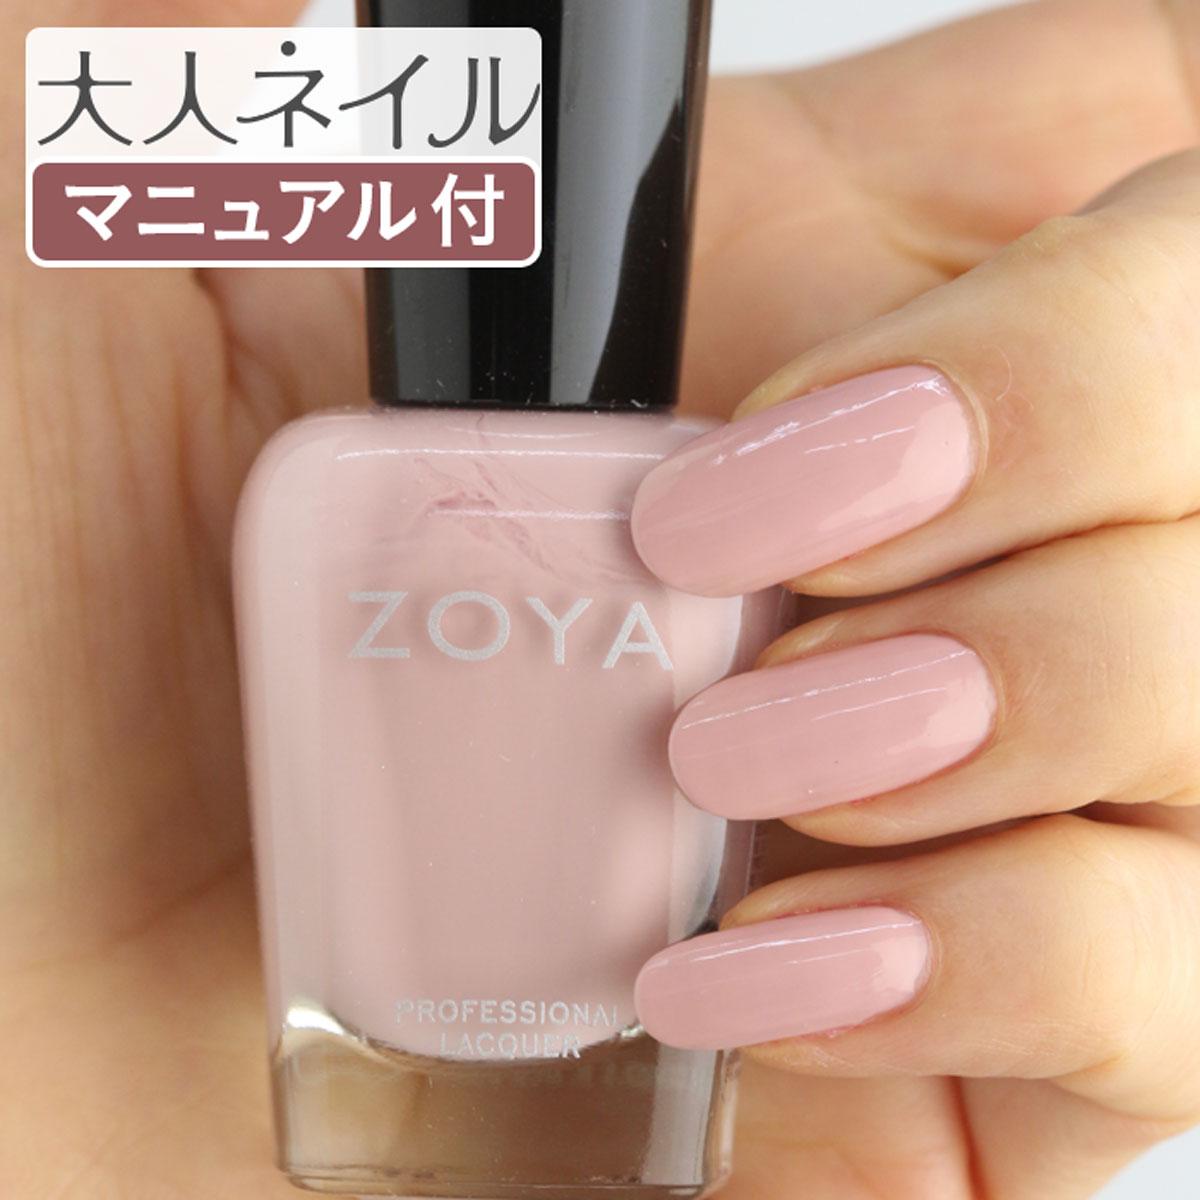 ZOYA ゾーヤ ゾヤ ネイルカラー ZP279 15mL AVRIL アヴリル 自爪 の為に作られた ネイル にやさしい 自然派 マニキュア zoya セルフネイル にもおすすめ トップ10 人気色 ピンク